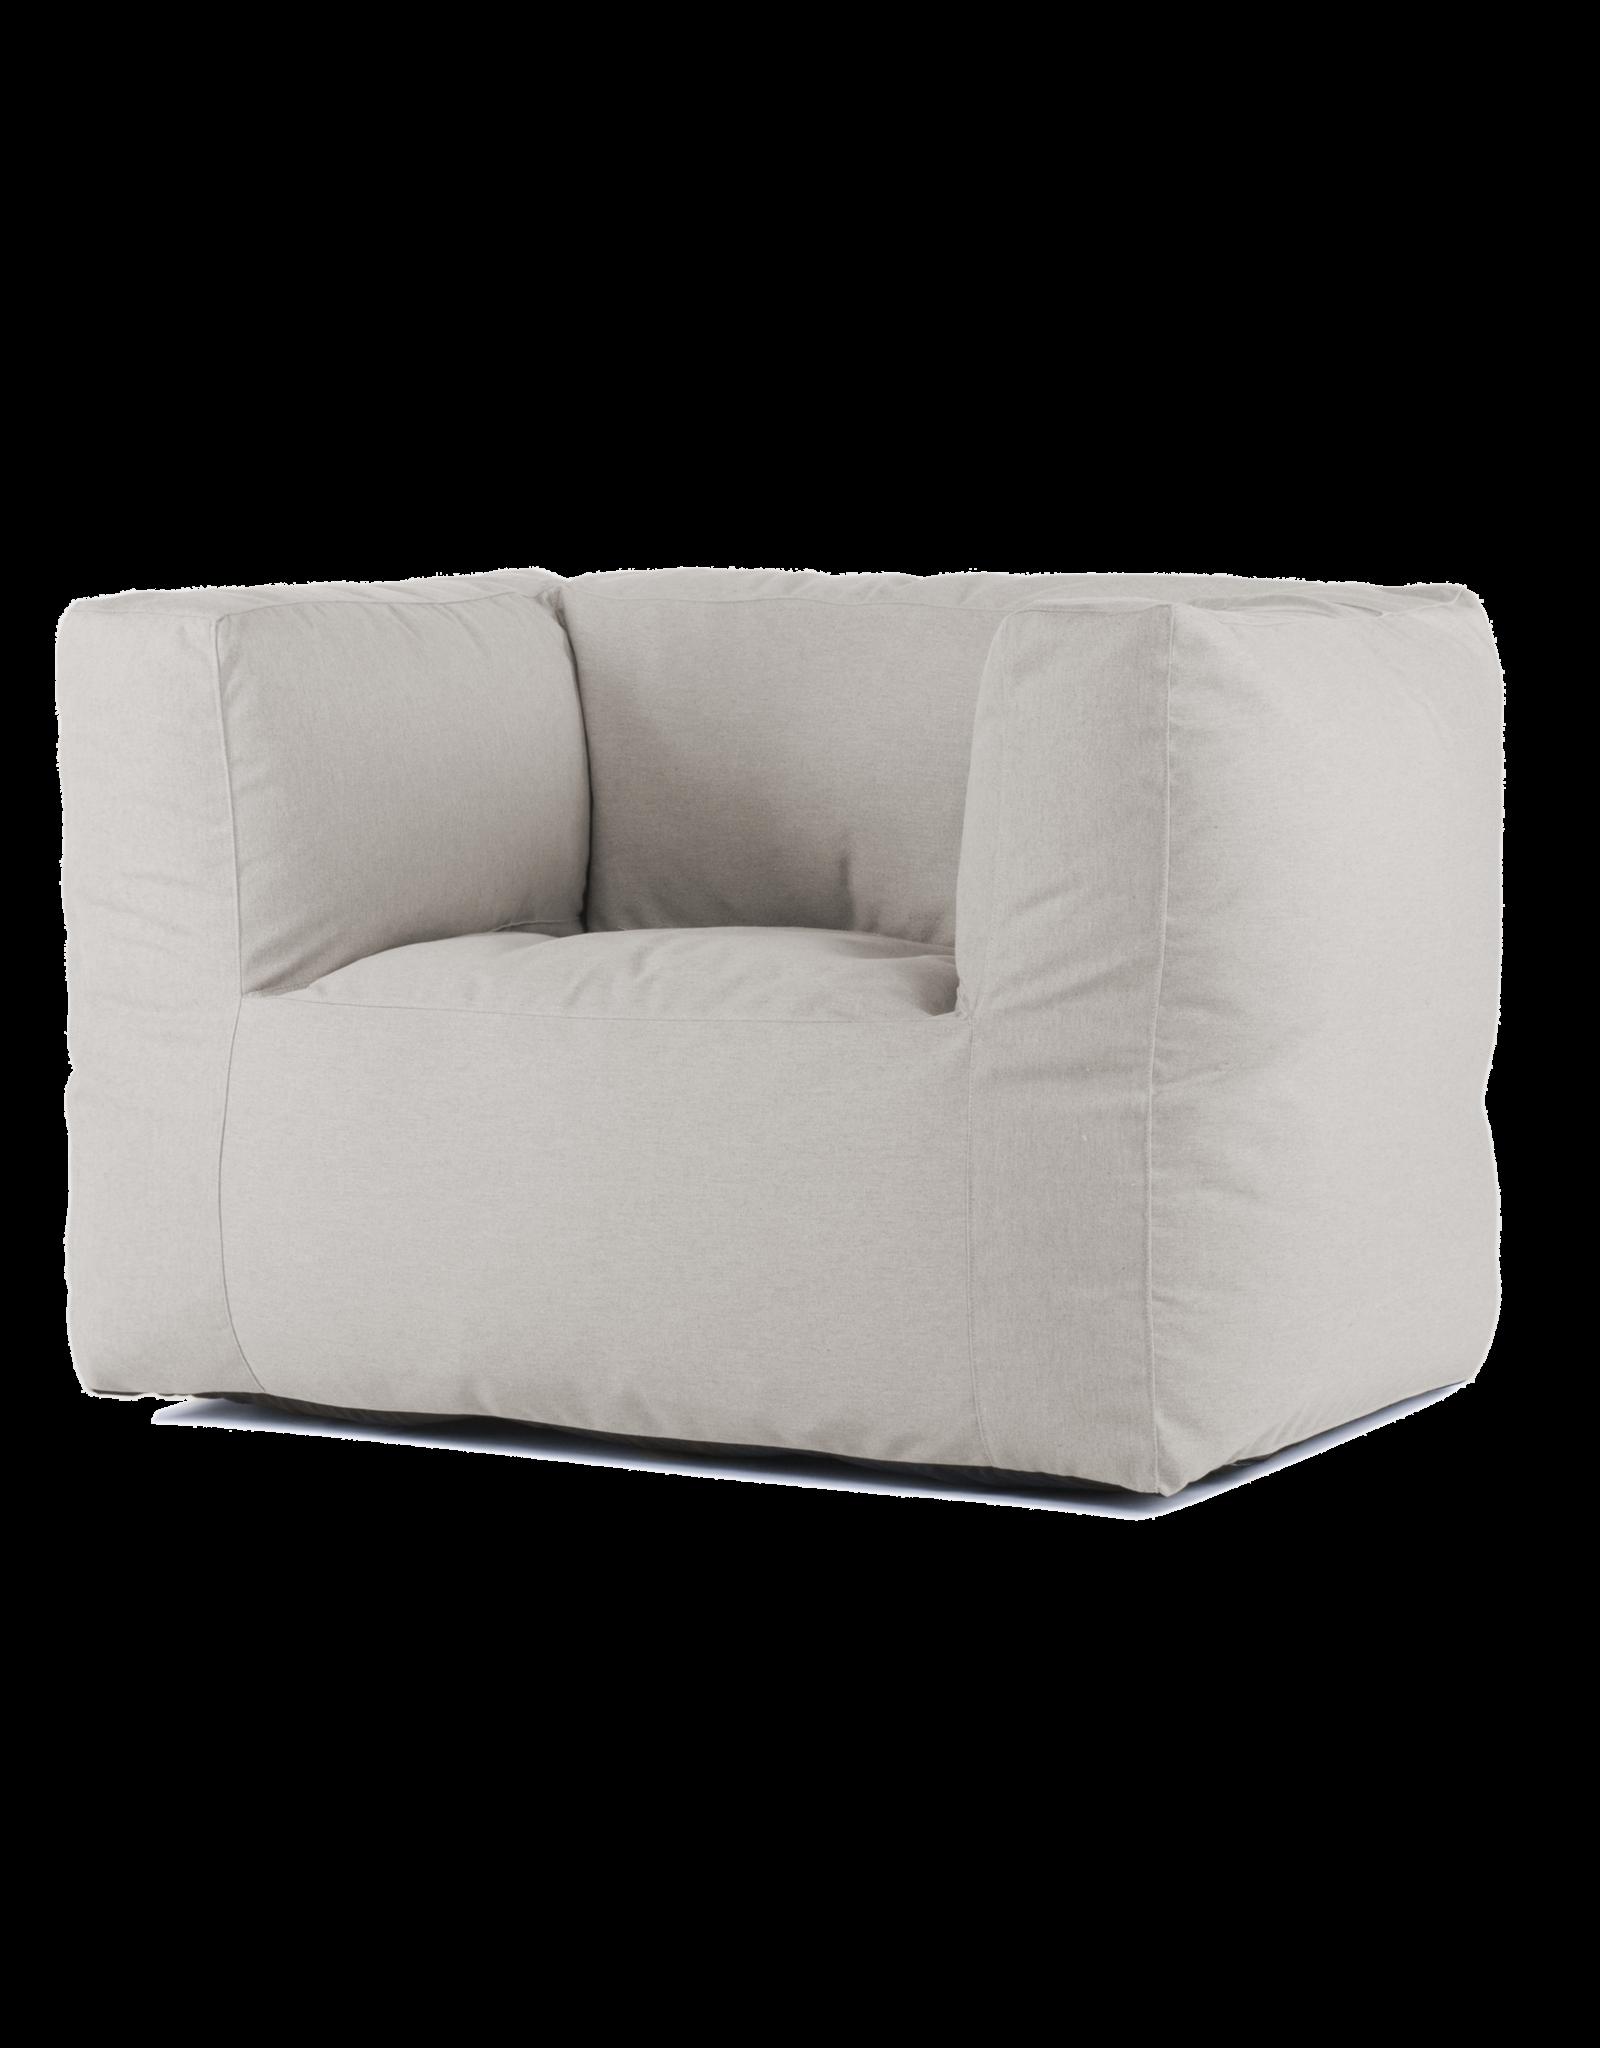 Bryck Bryck - chair - Grey eco light